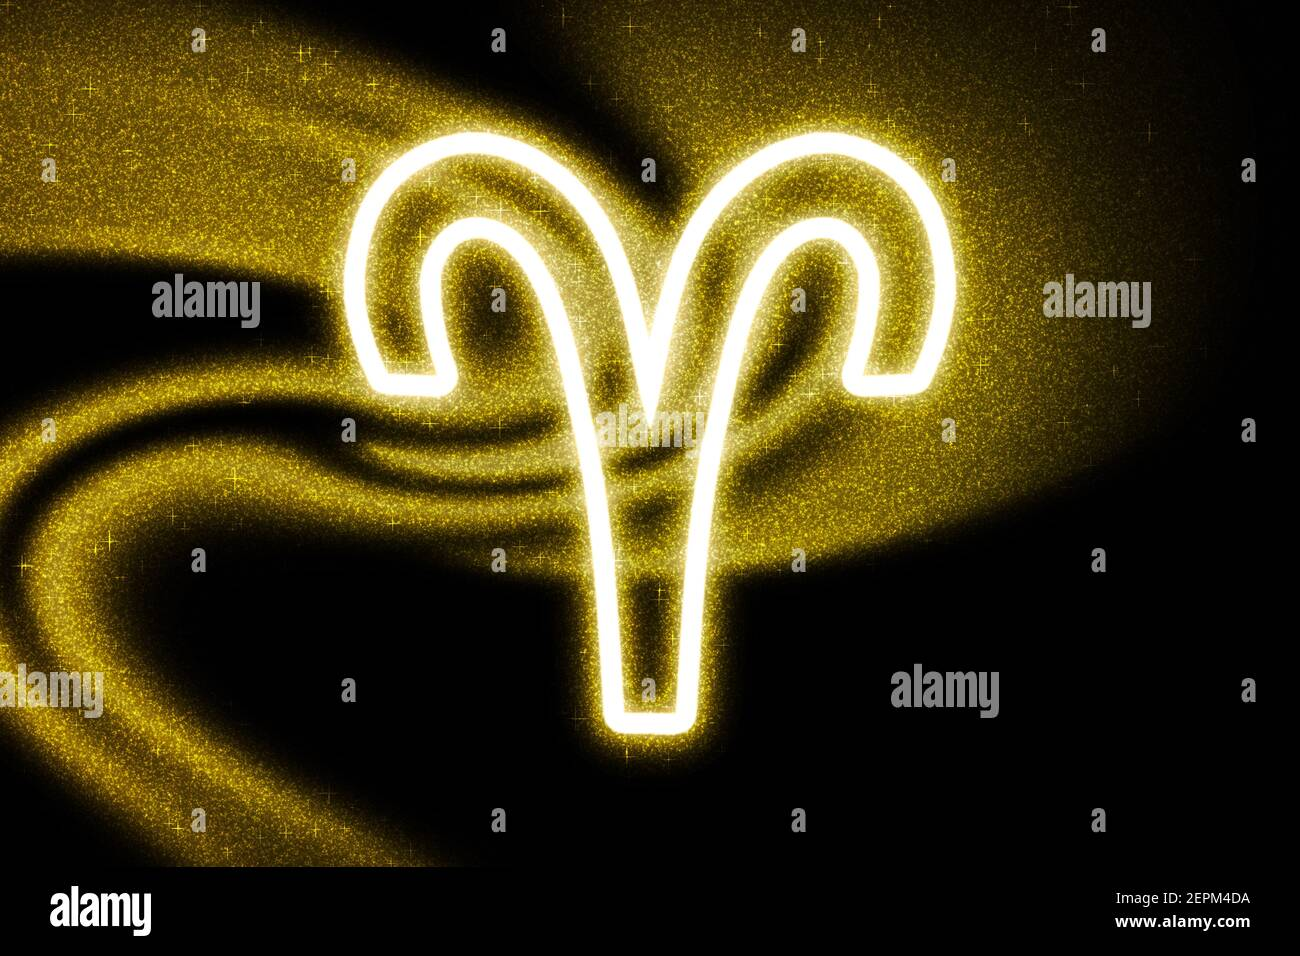 Aries Zodiac Sign Gold Glitter Horoscope Astrology Background Aries Horoscope Symbol On Dark Background Stock Photo Alamy